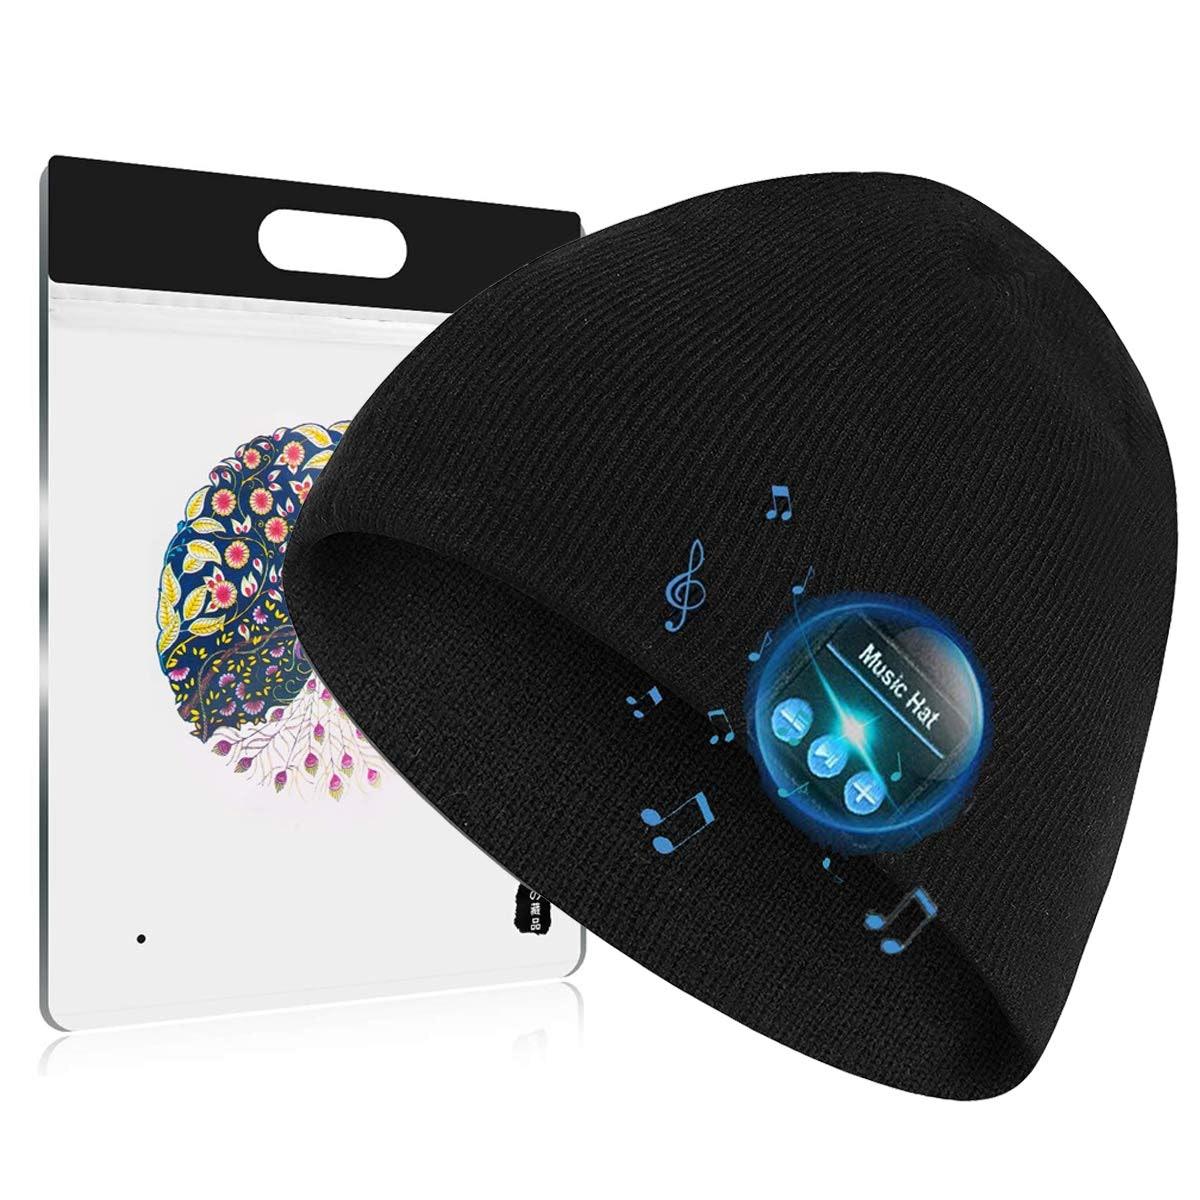 BLUEHRESY Bluetooth Beanie Hat